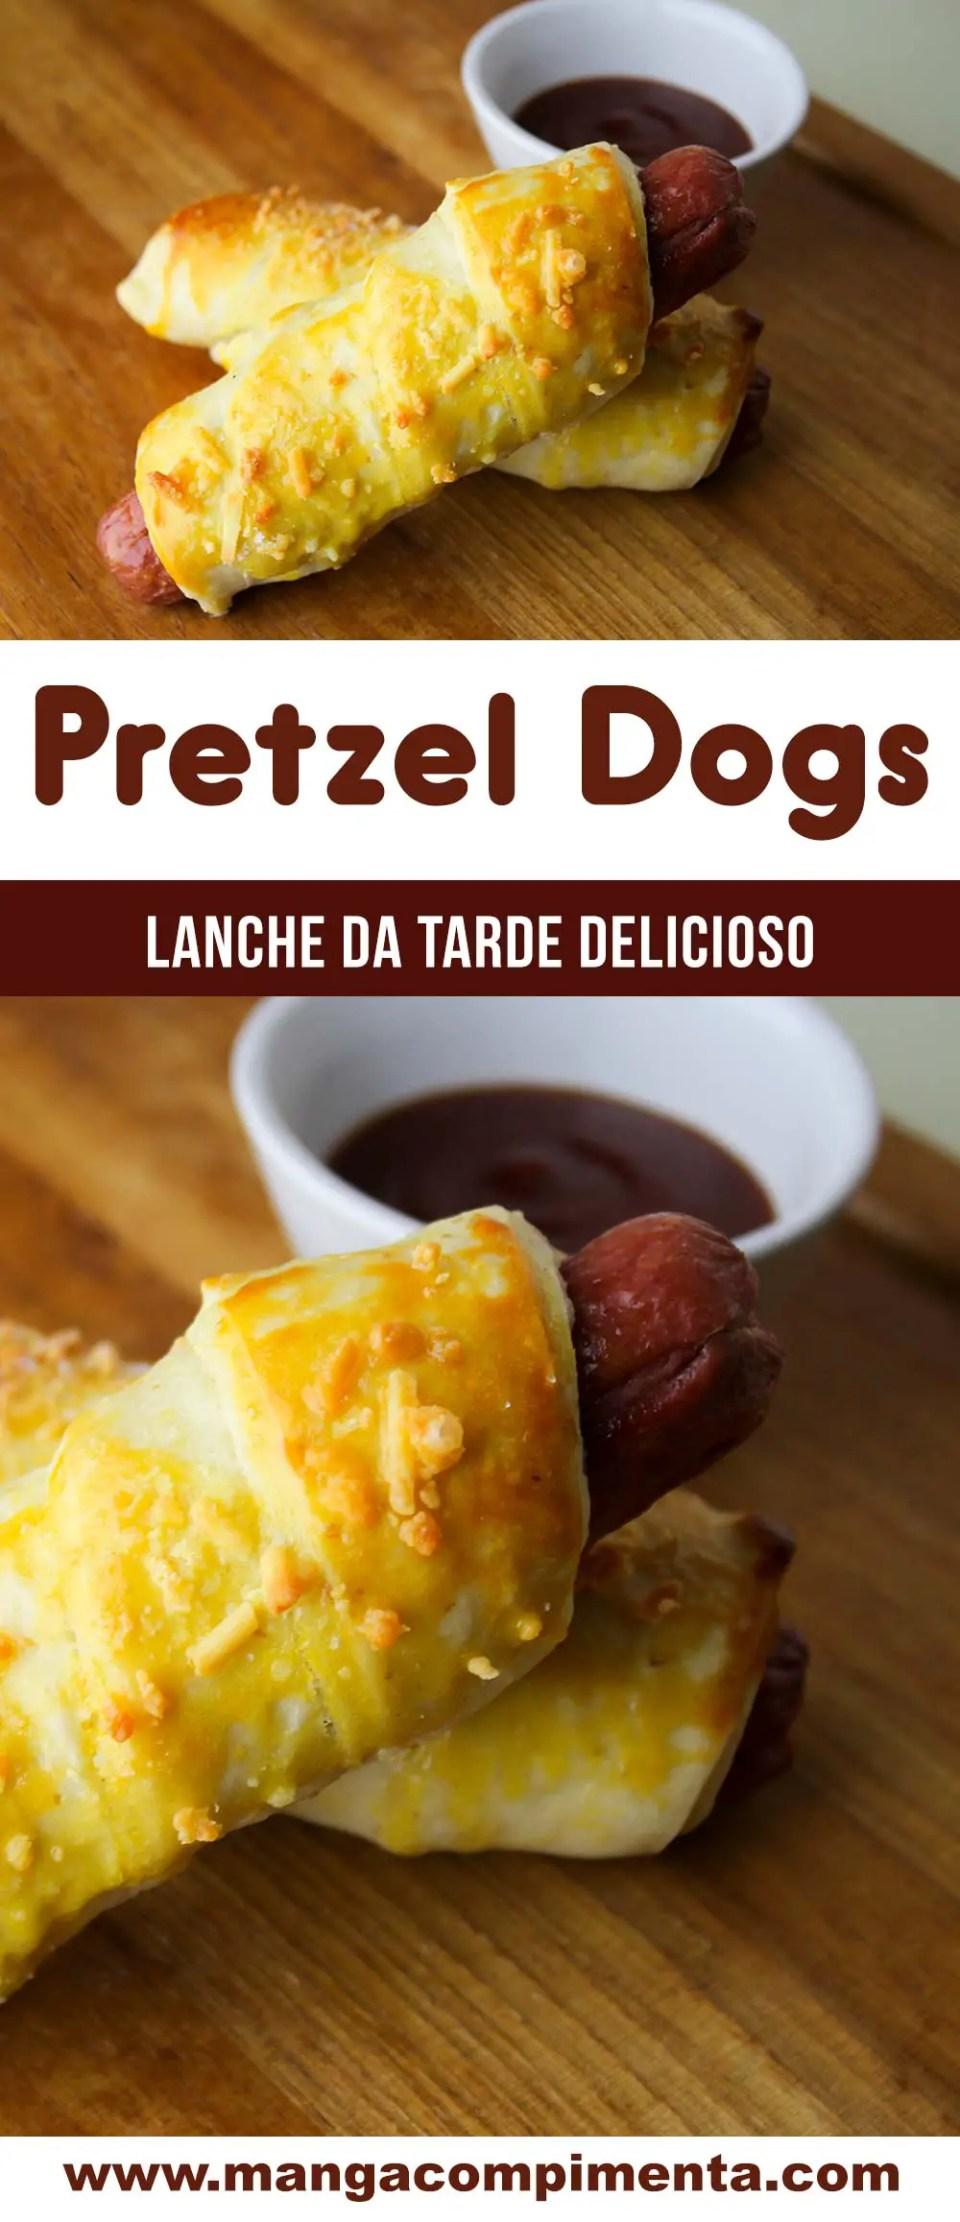 Pretzel Dogs - Um petisco delicioso para o lanche da tarde!